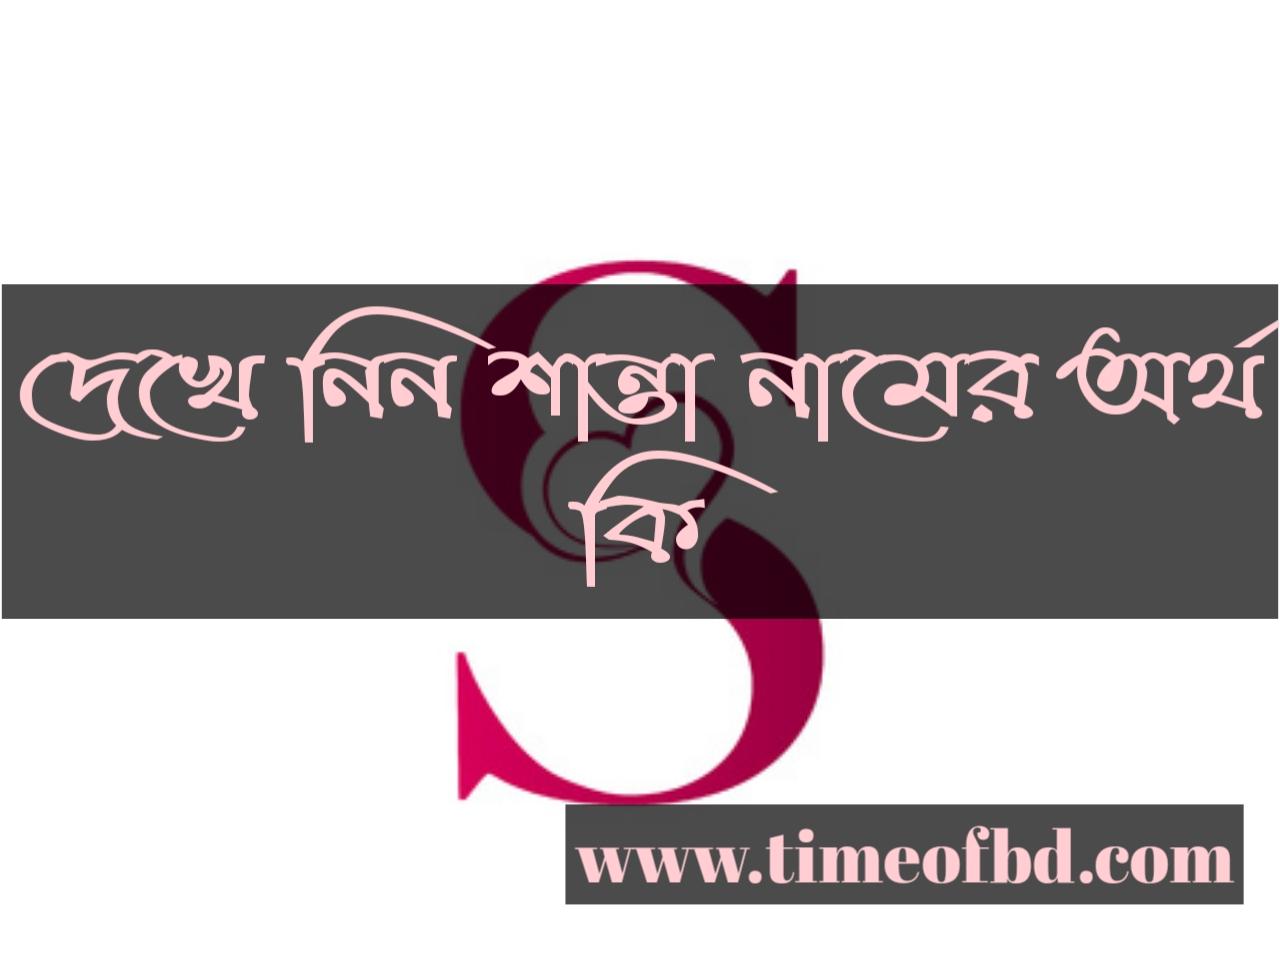 Santa name meaning in Bengali, শান্তা নামের অর্থ কি, শান্তা নামের বাংলা অর্থ কি, শান্তা নামের ইসলামিক অর্থ কি,